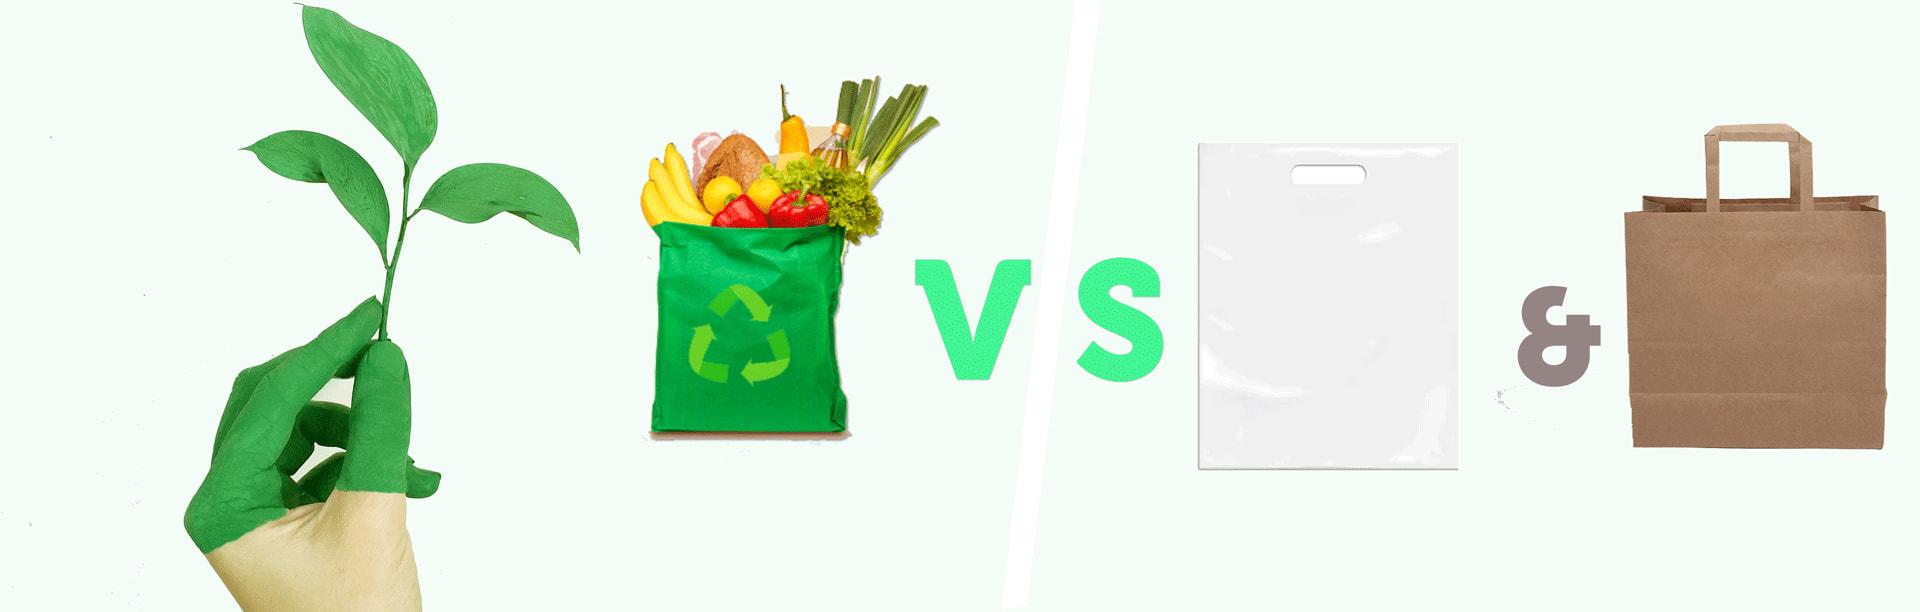 reusable bags vs plastic bags and paper bags